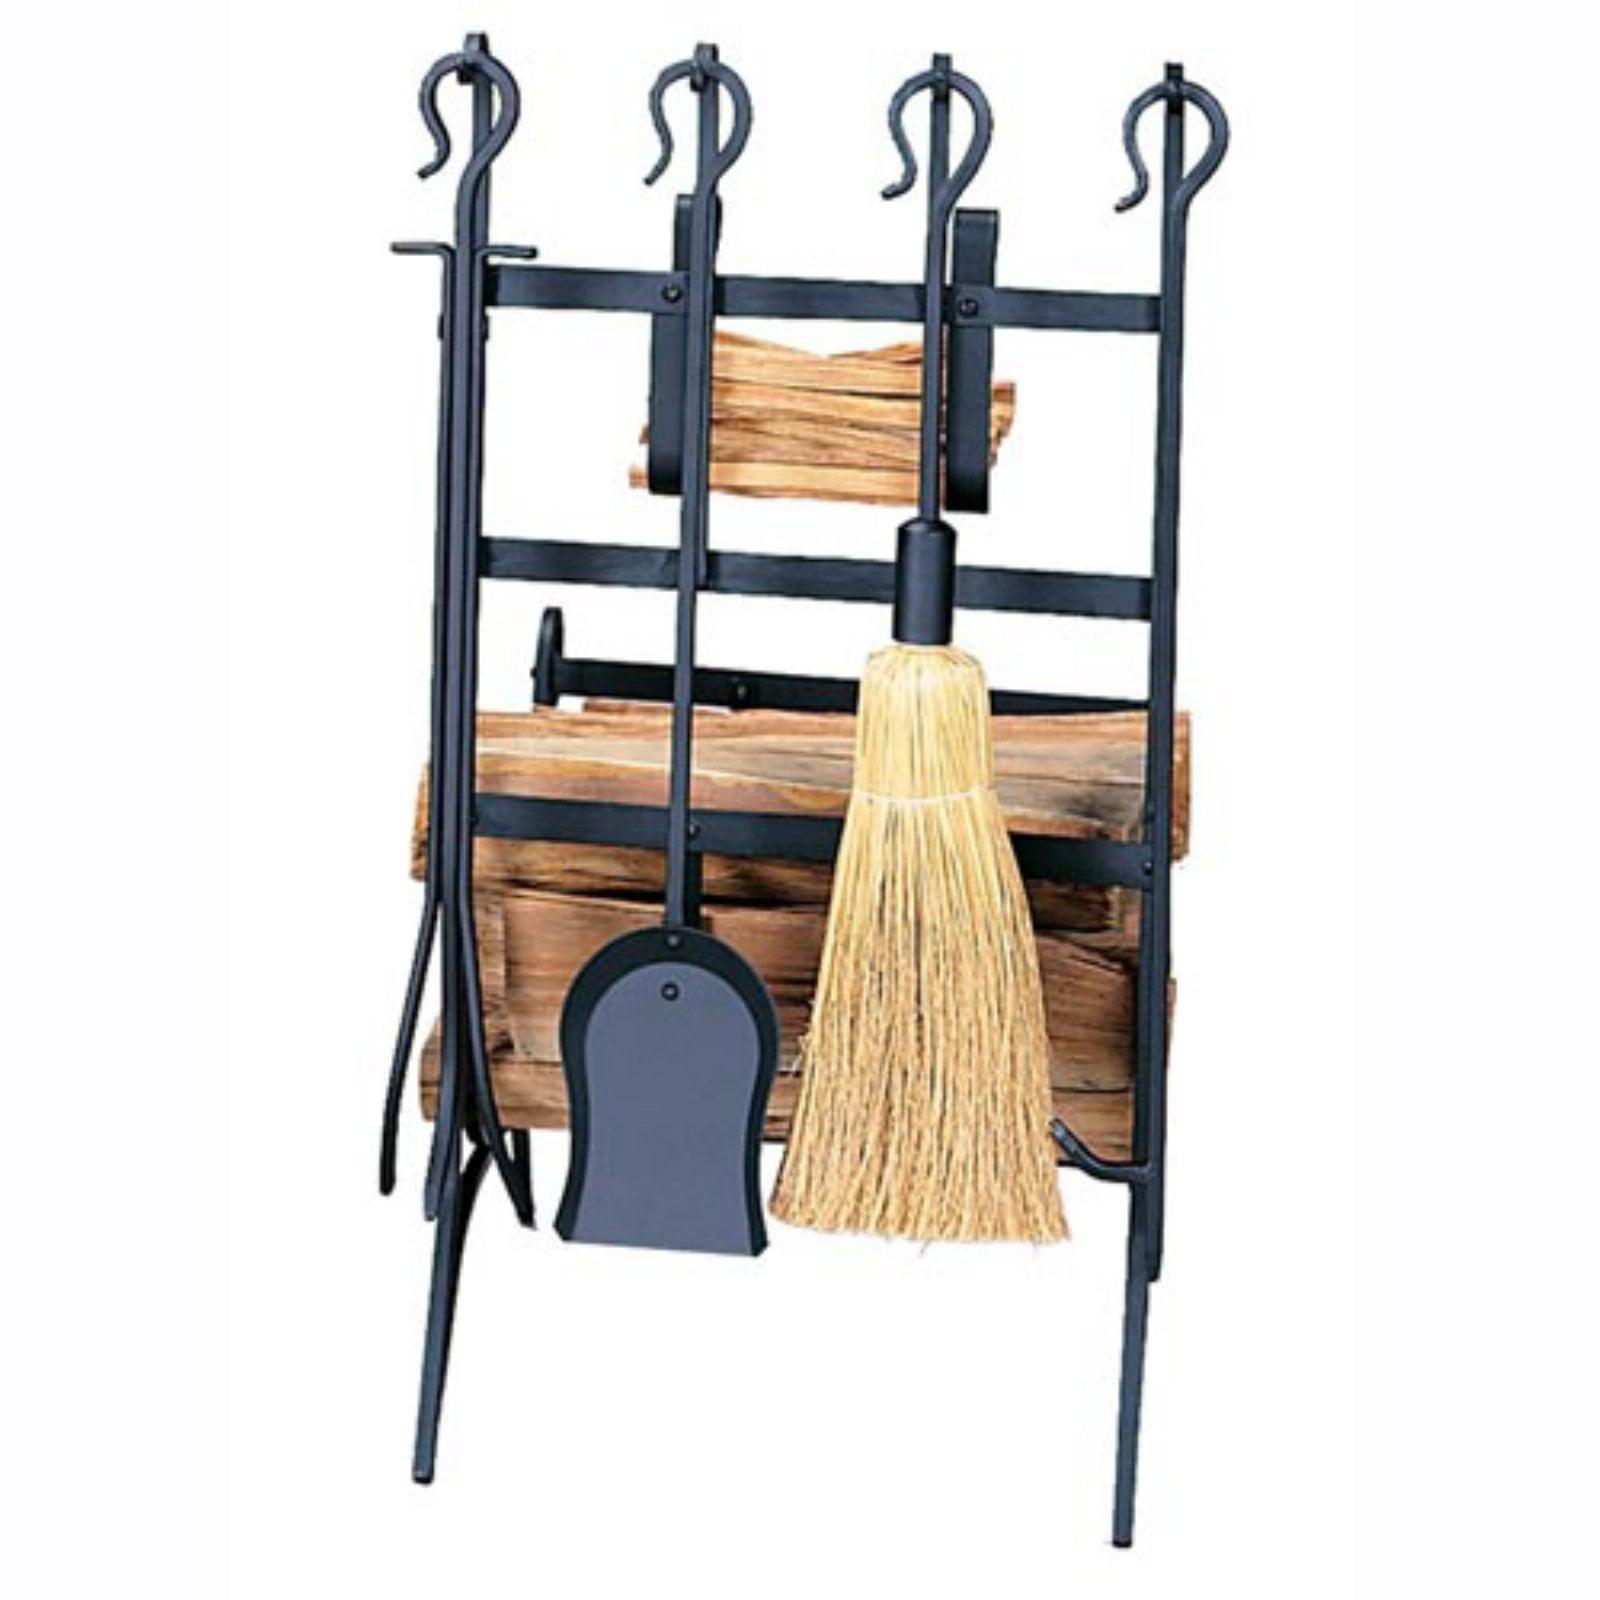 Uniflame Port Hook Handle Fireplace Tool Set and Log Rack